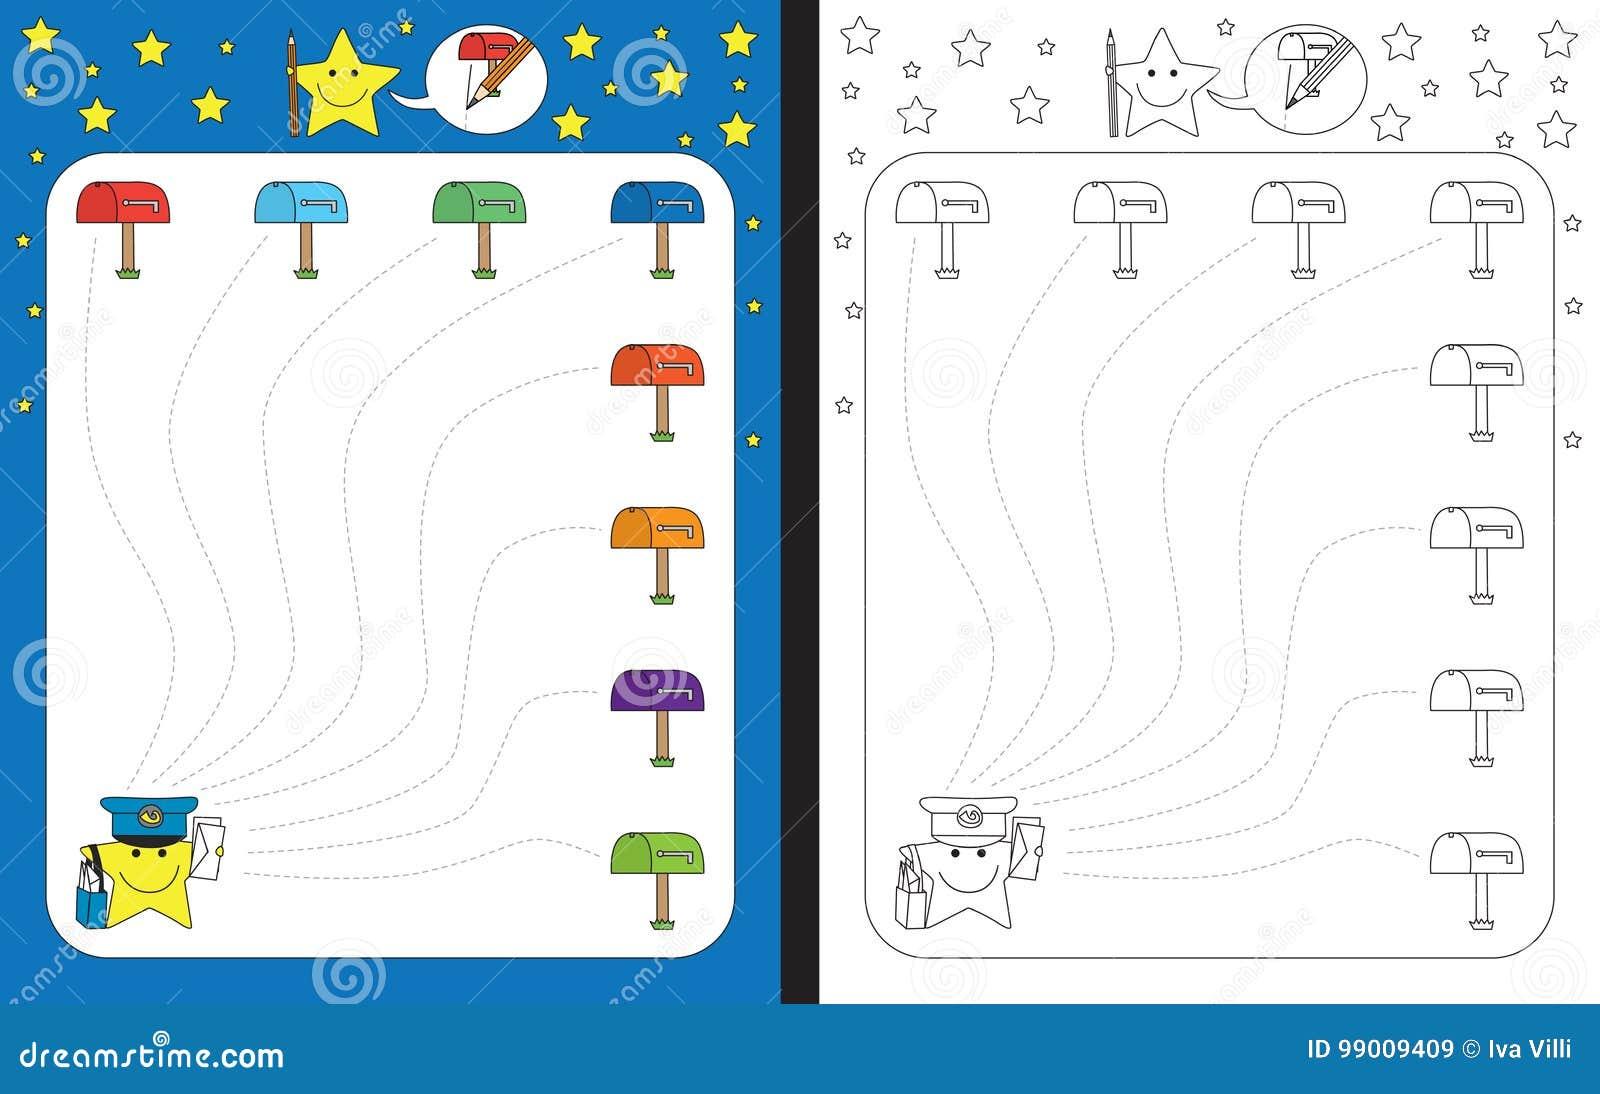 Preschool Worksheet Stock Vector Illustration Of Color 99009409